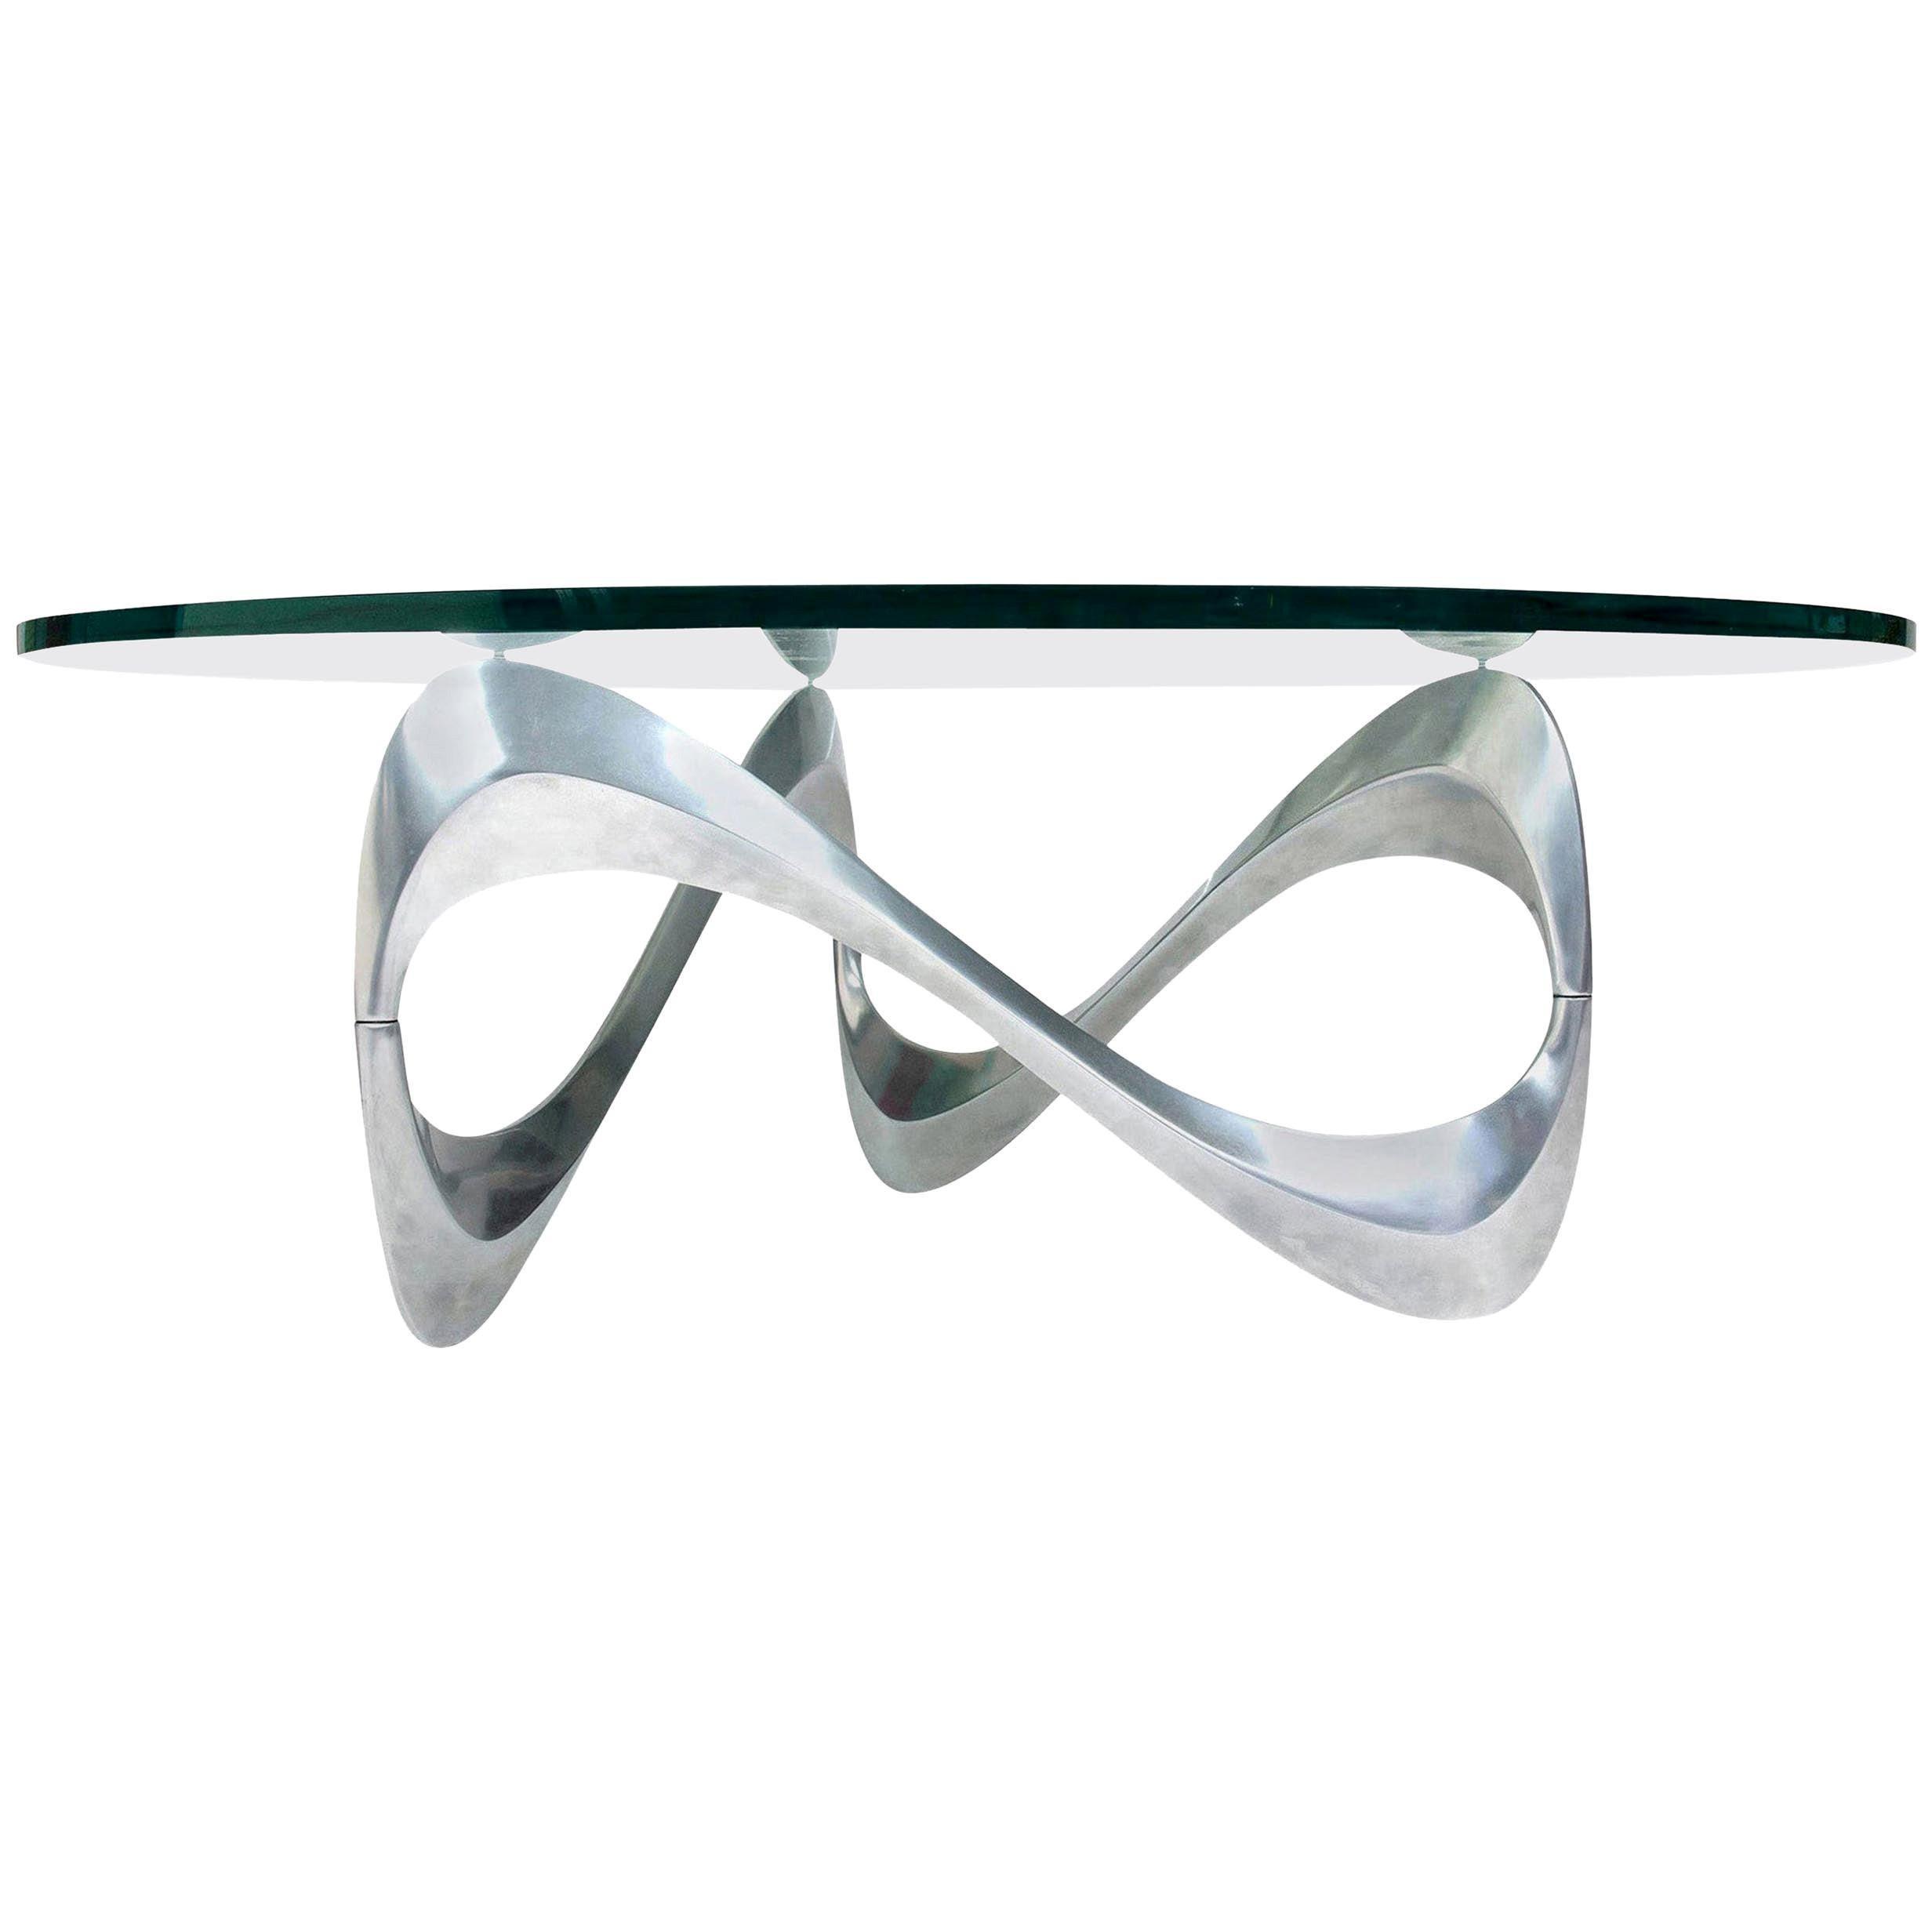 "Knut Hesterberg Aluminum and Glass ""Snake"" Coffee Table by Ronald Schmitt, 1960s"